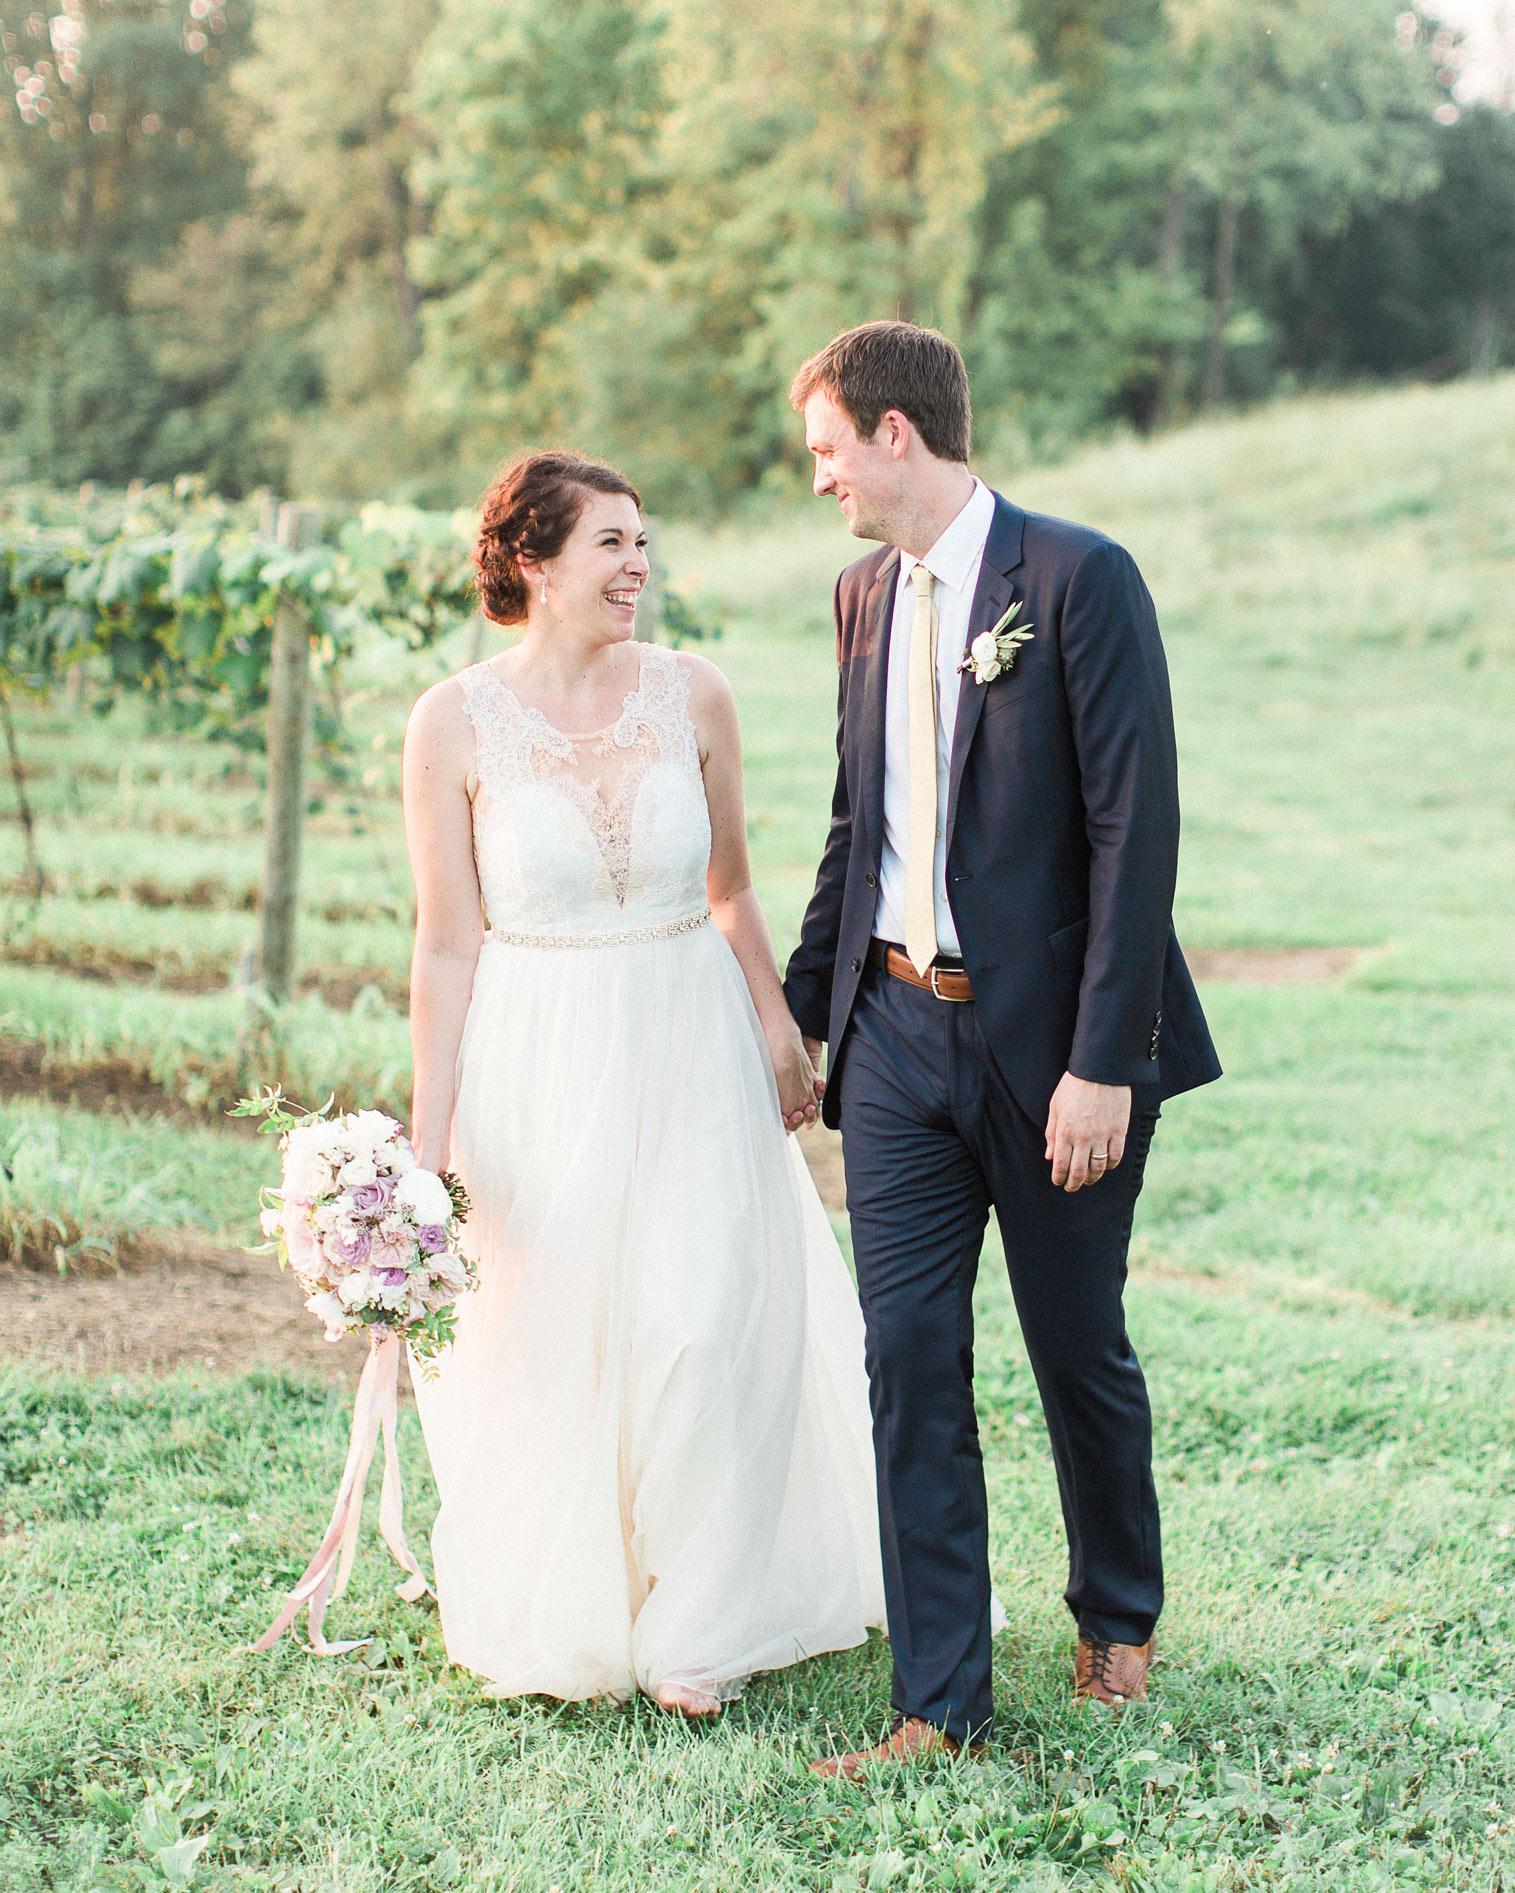 sarah-michael-wedding-couple-931-s112783-0416.jpg